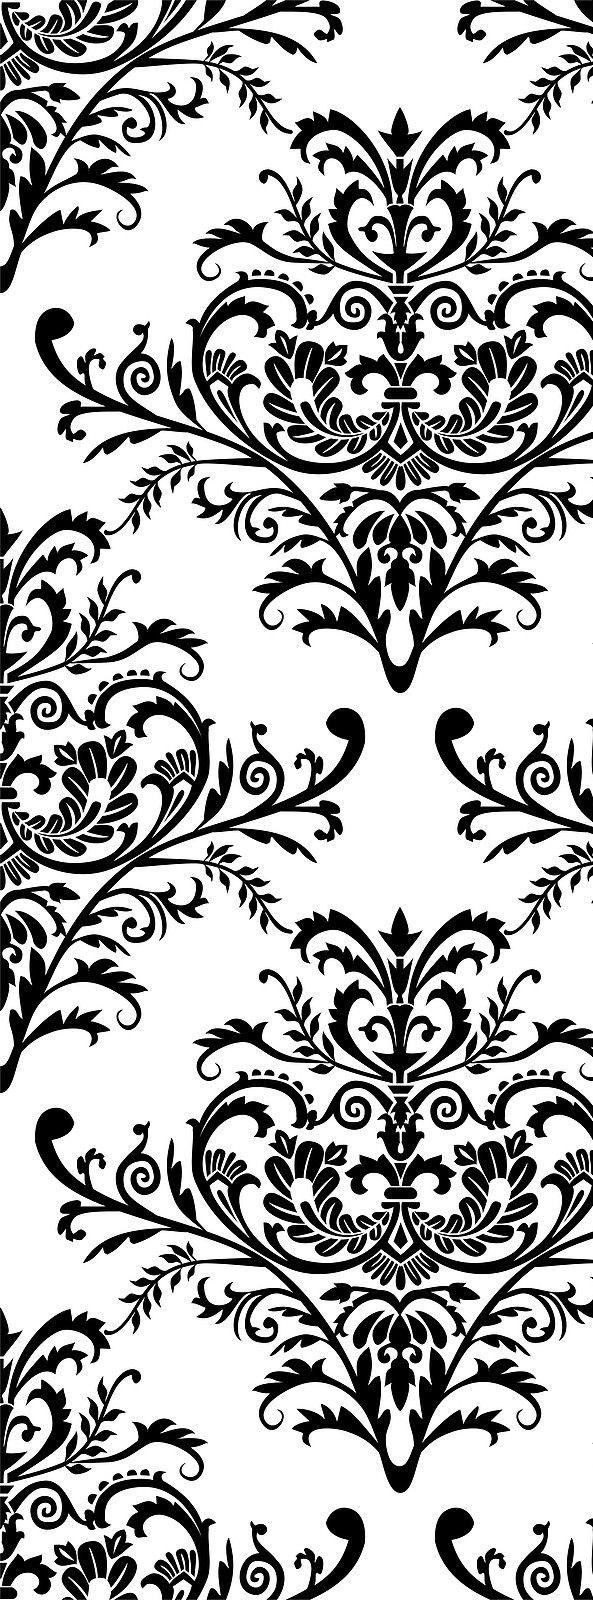 Baroque pattern black and white httphtctokok infinity http baroque pattern black and white httphtctokok infinity http doublecrazyfo Gallery